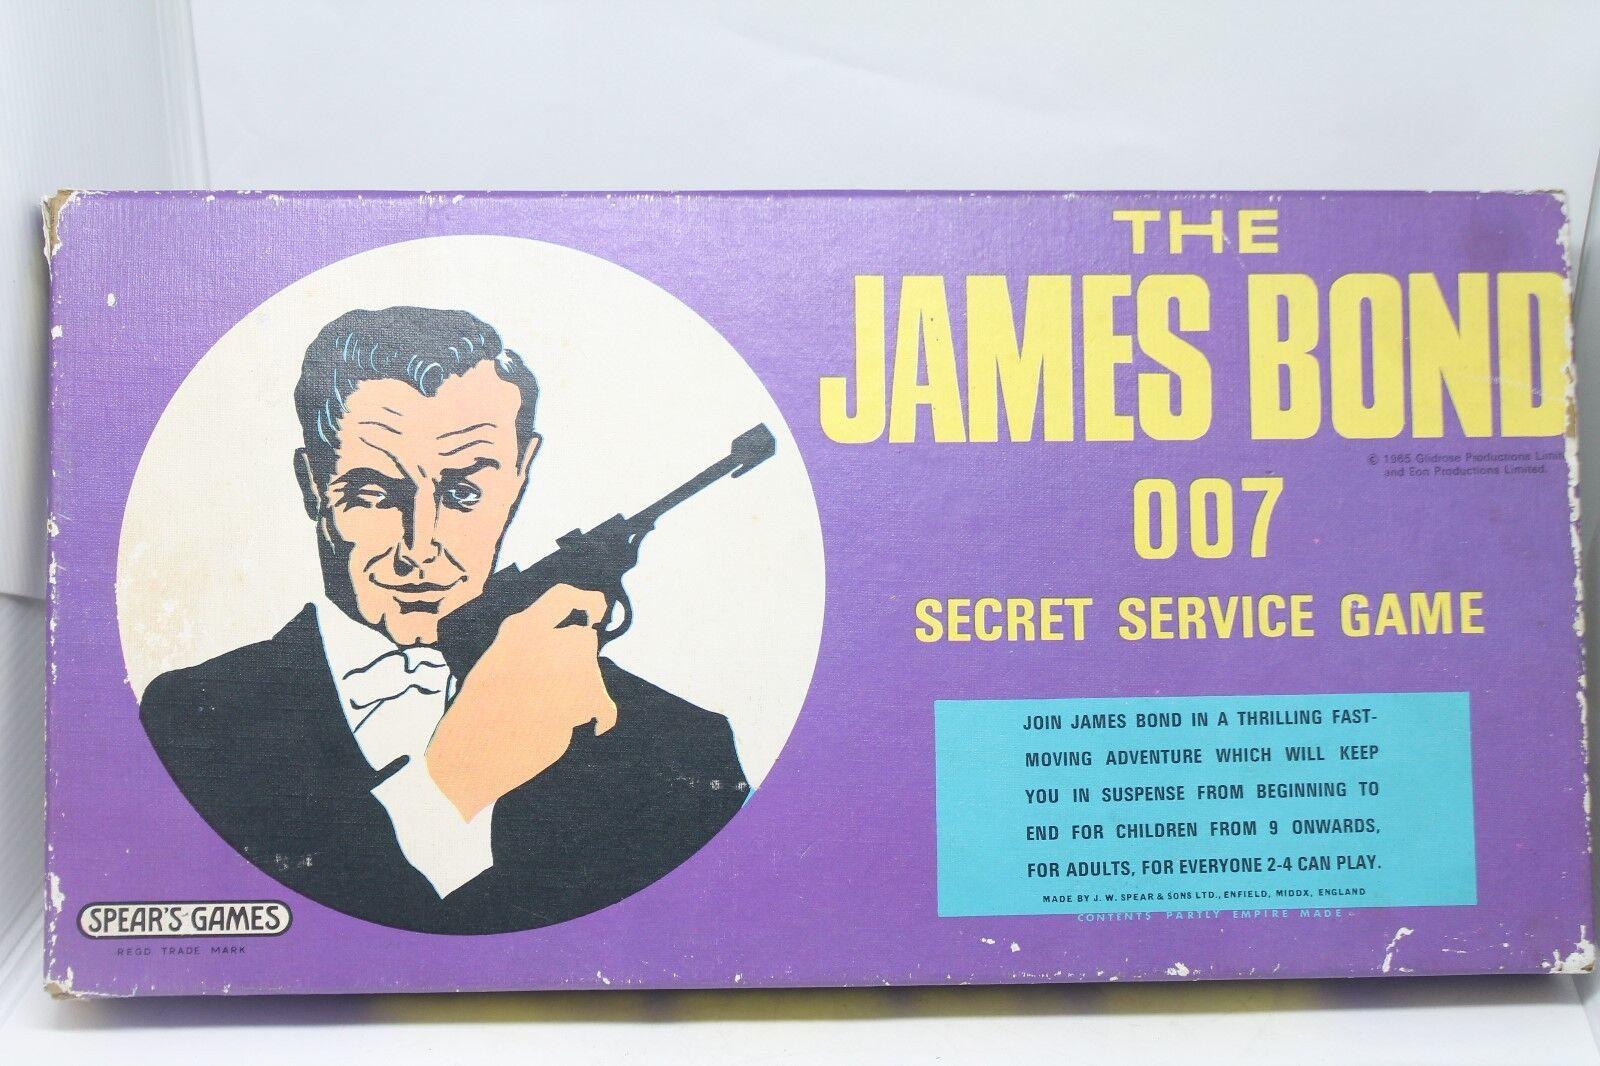 SPEARS GAMES  JAMES BOND SECRET SERVICE GAME  1966  OVP  RAR